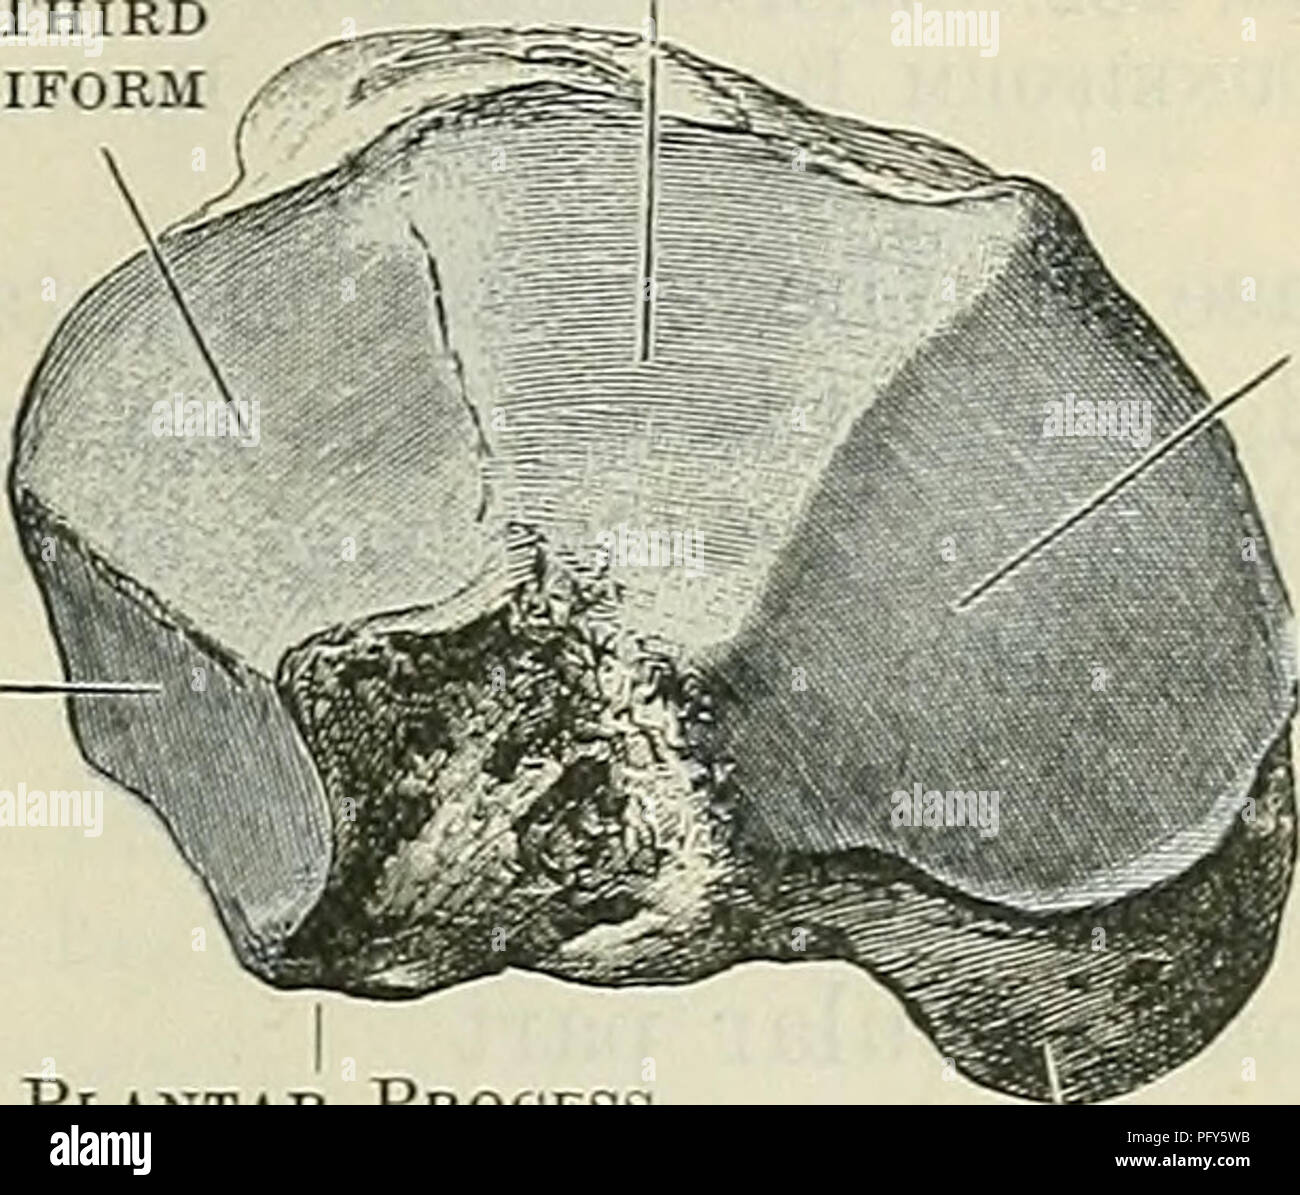 Cunningham\'s Text-book of anatomy. Anatomy. THE CUNEIFOEM BONES. 261 ...